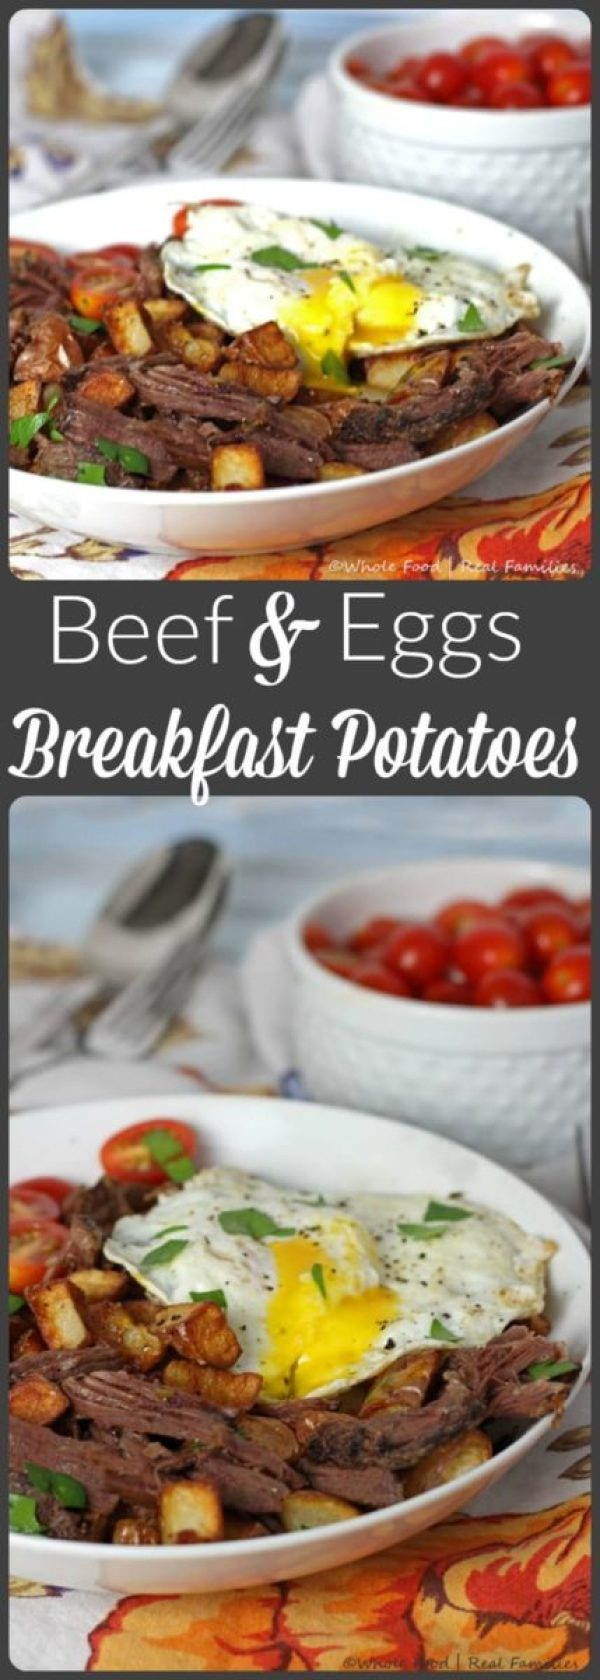 Beef and Eggs over Breakfast Potatoes